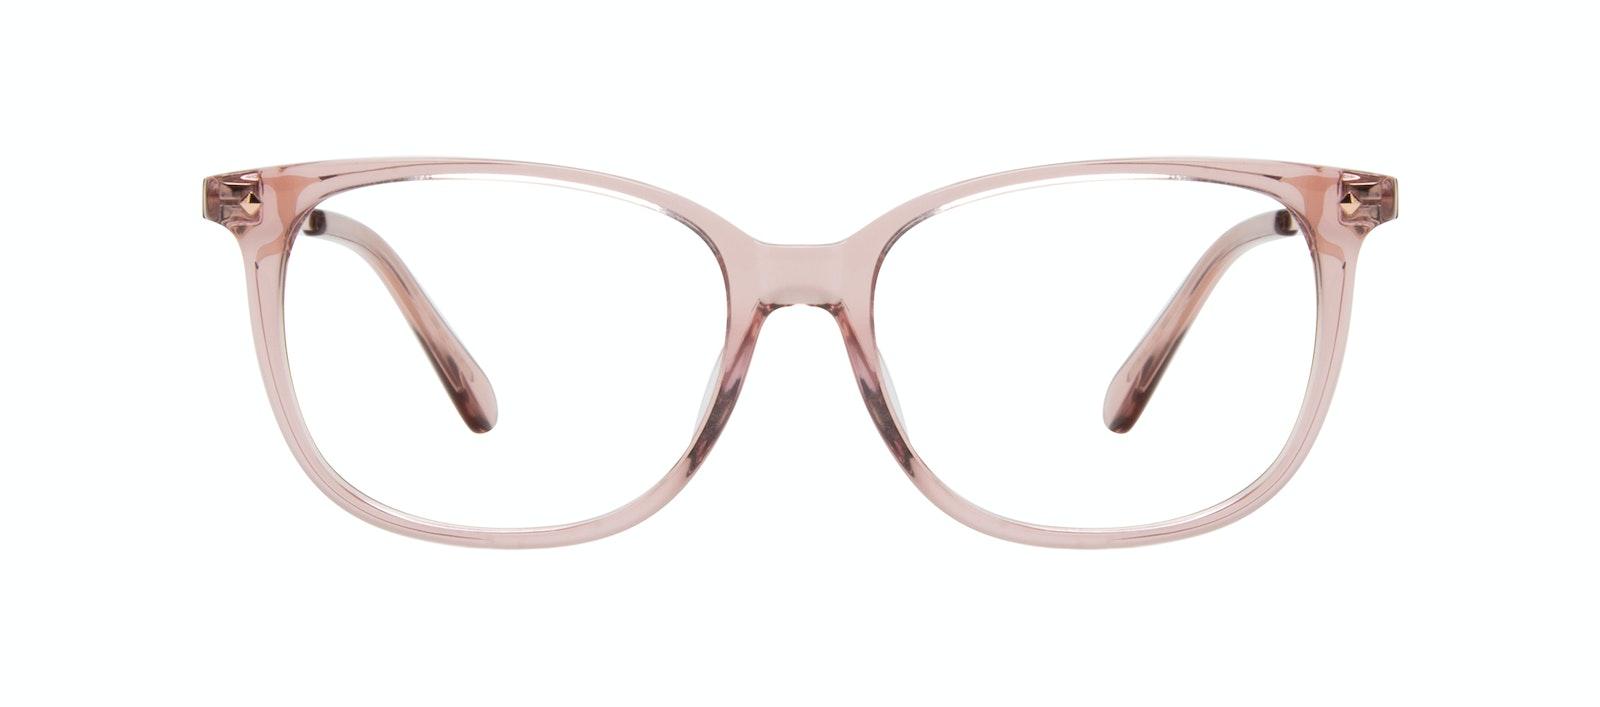 Affordable Fashion Glasses Rectangle Square Eyeglasses Women Refine Rose Front